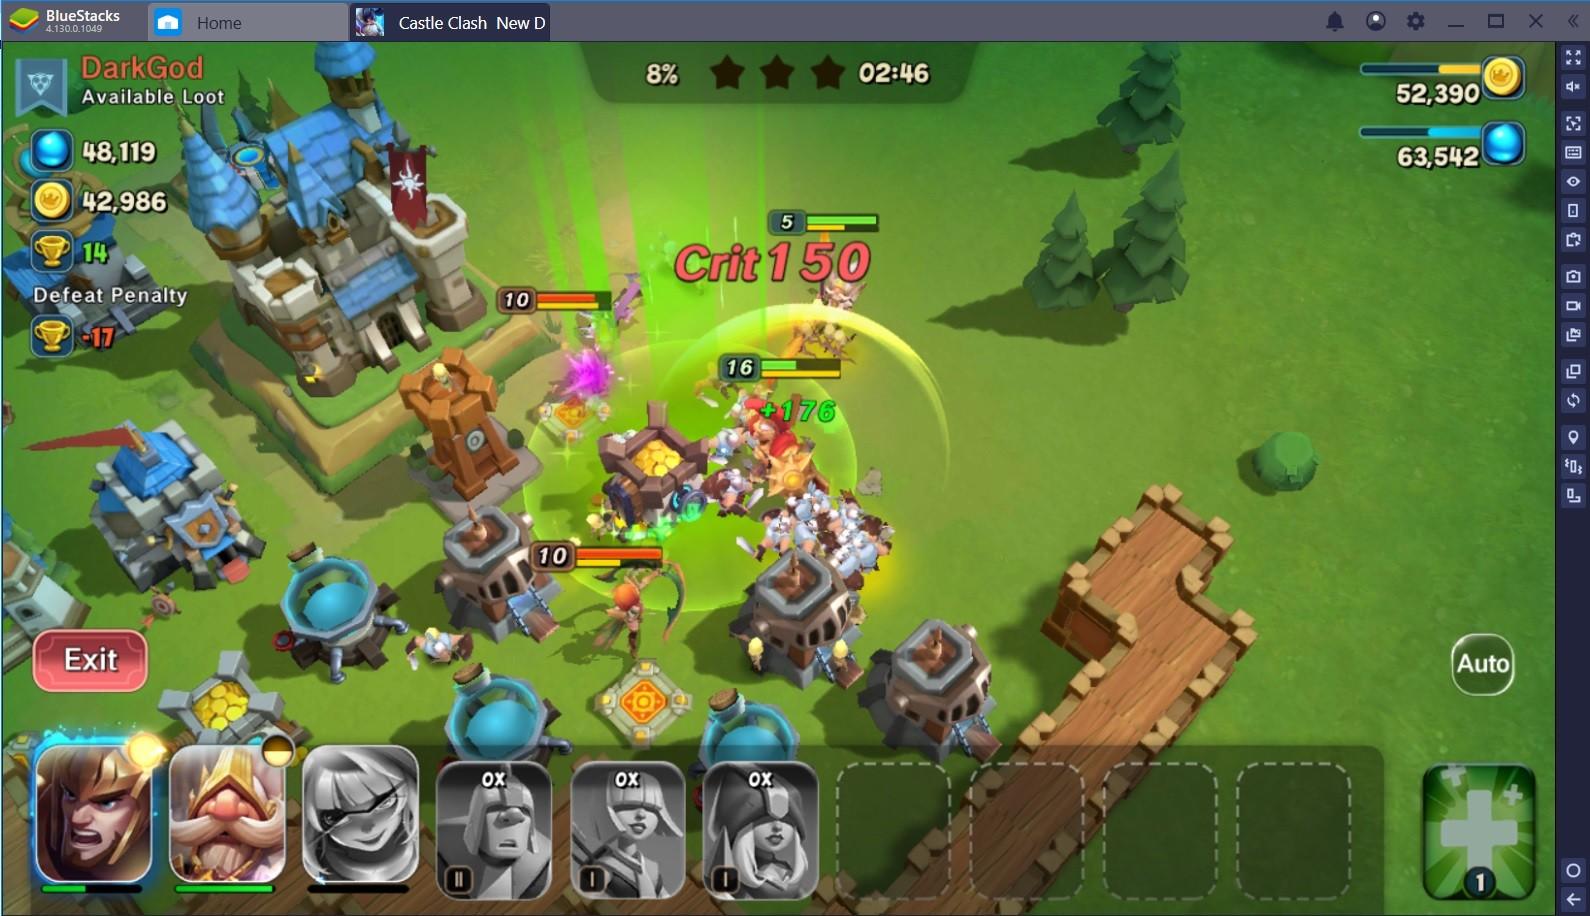 Castle Clash: New Dawn – Works Even Better on BlueStacks